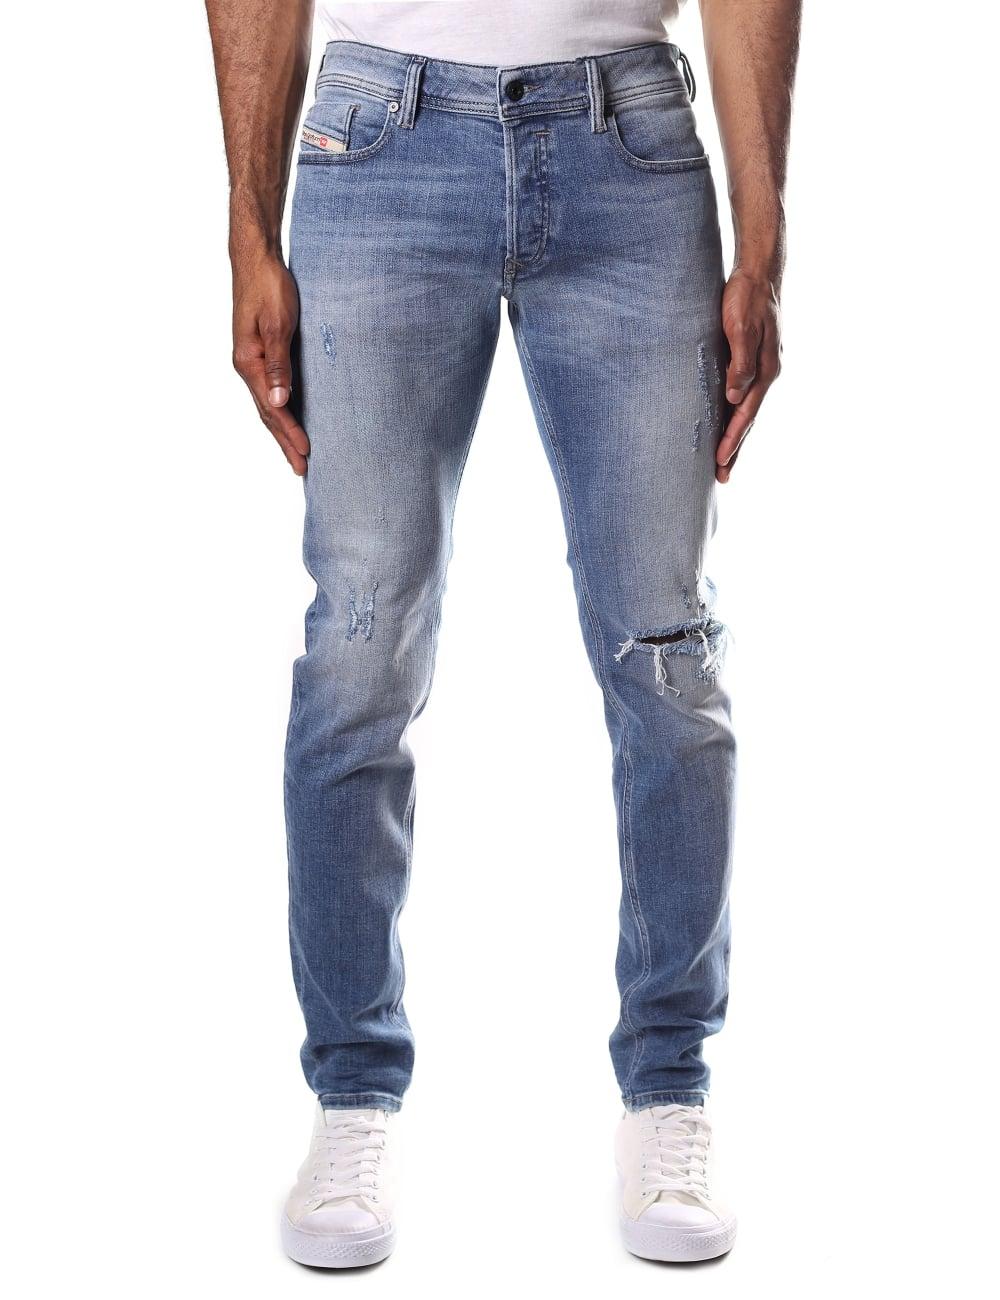 am besten wählen 50-70% Rabatt neueste art Diesel Sleenker 84GL Men's Slim Fit Jean